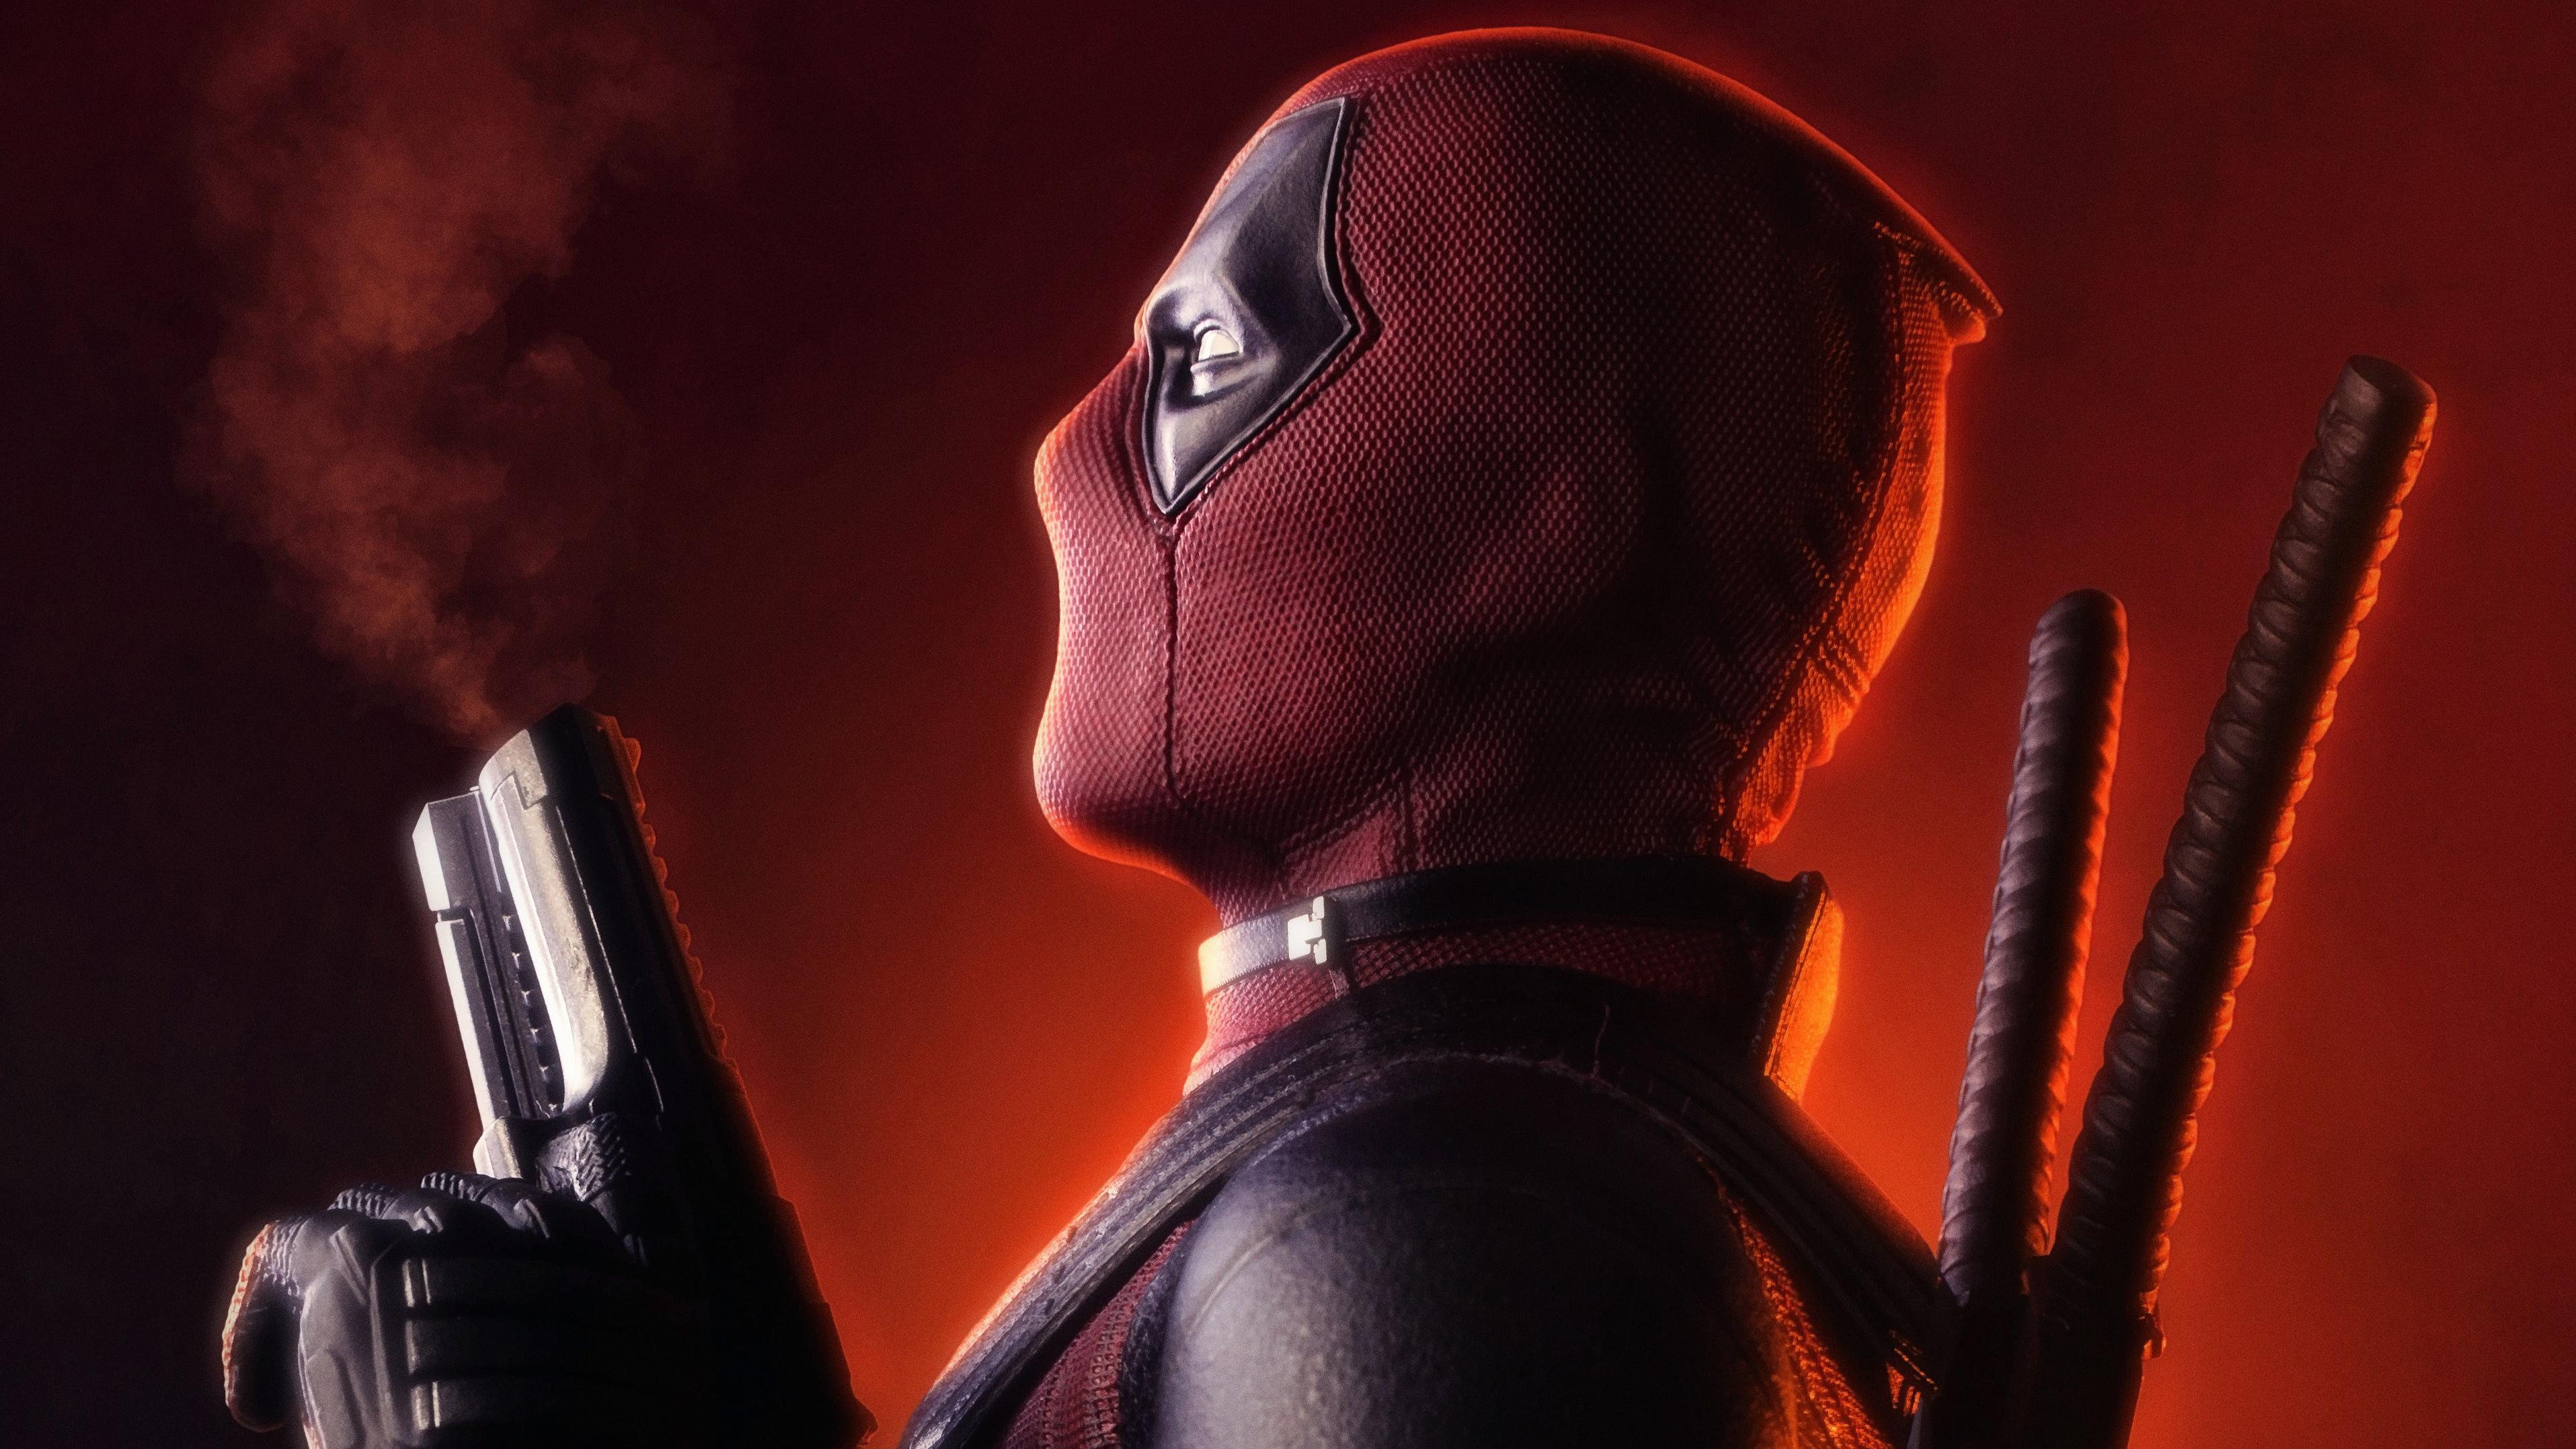 4k Deadpool 2018 Hd Superheroes 4k Wallpapers Images Backgrounds